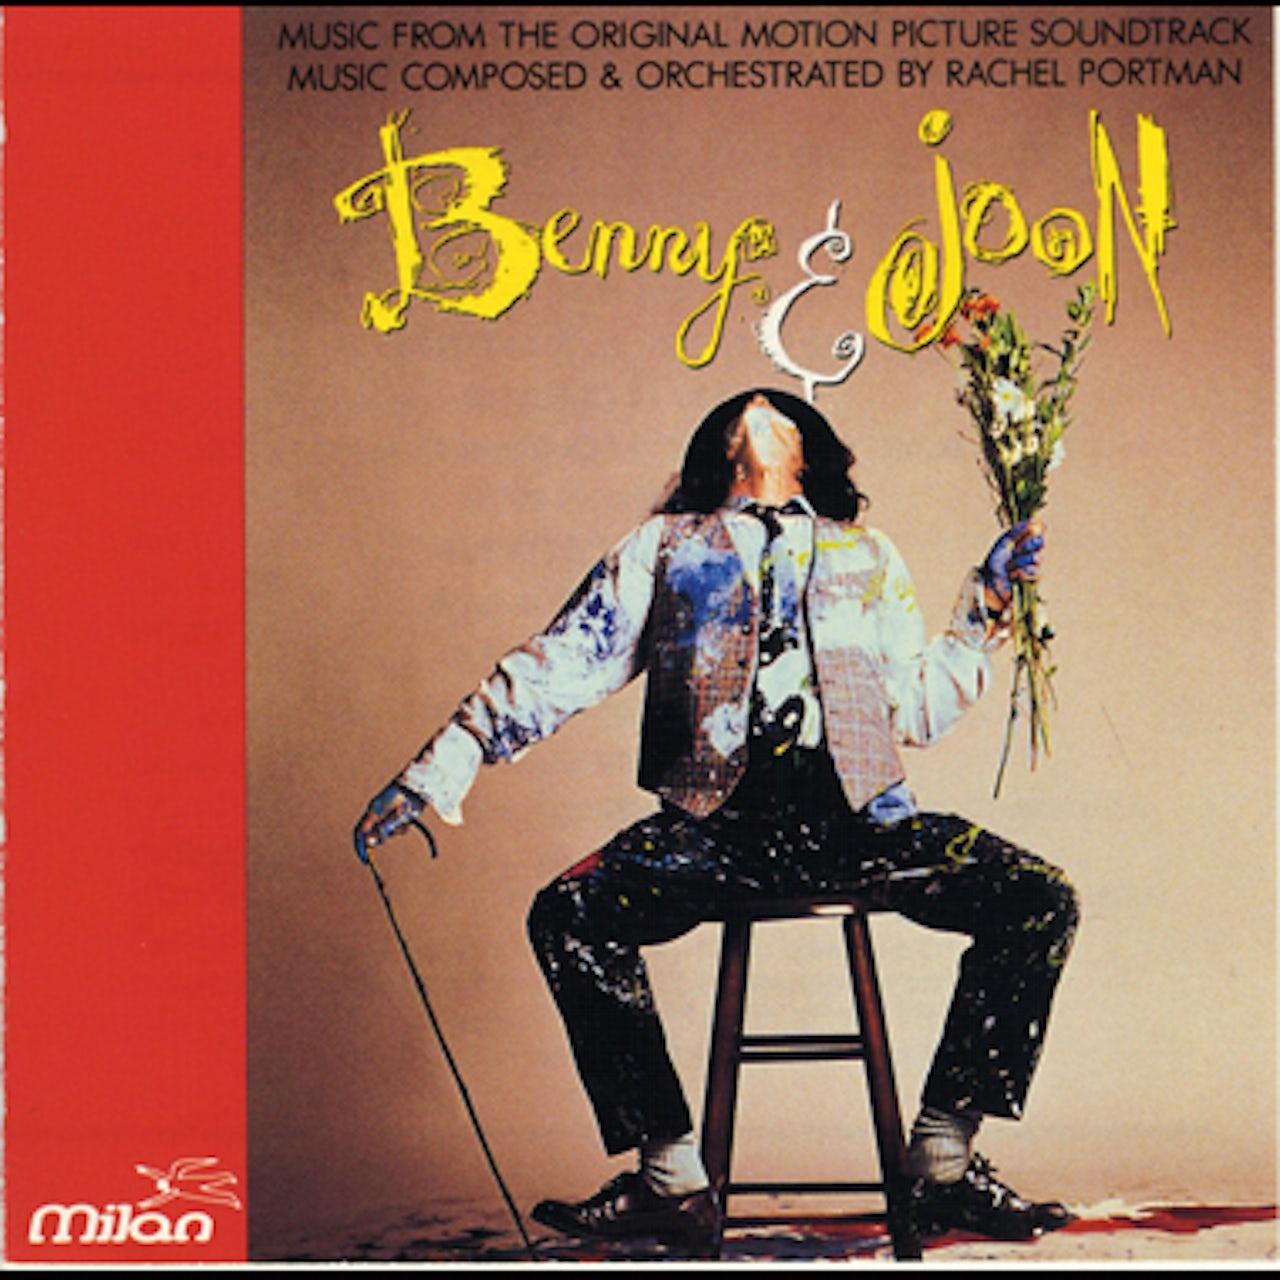 Rachel Portman Benny & Joon CD